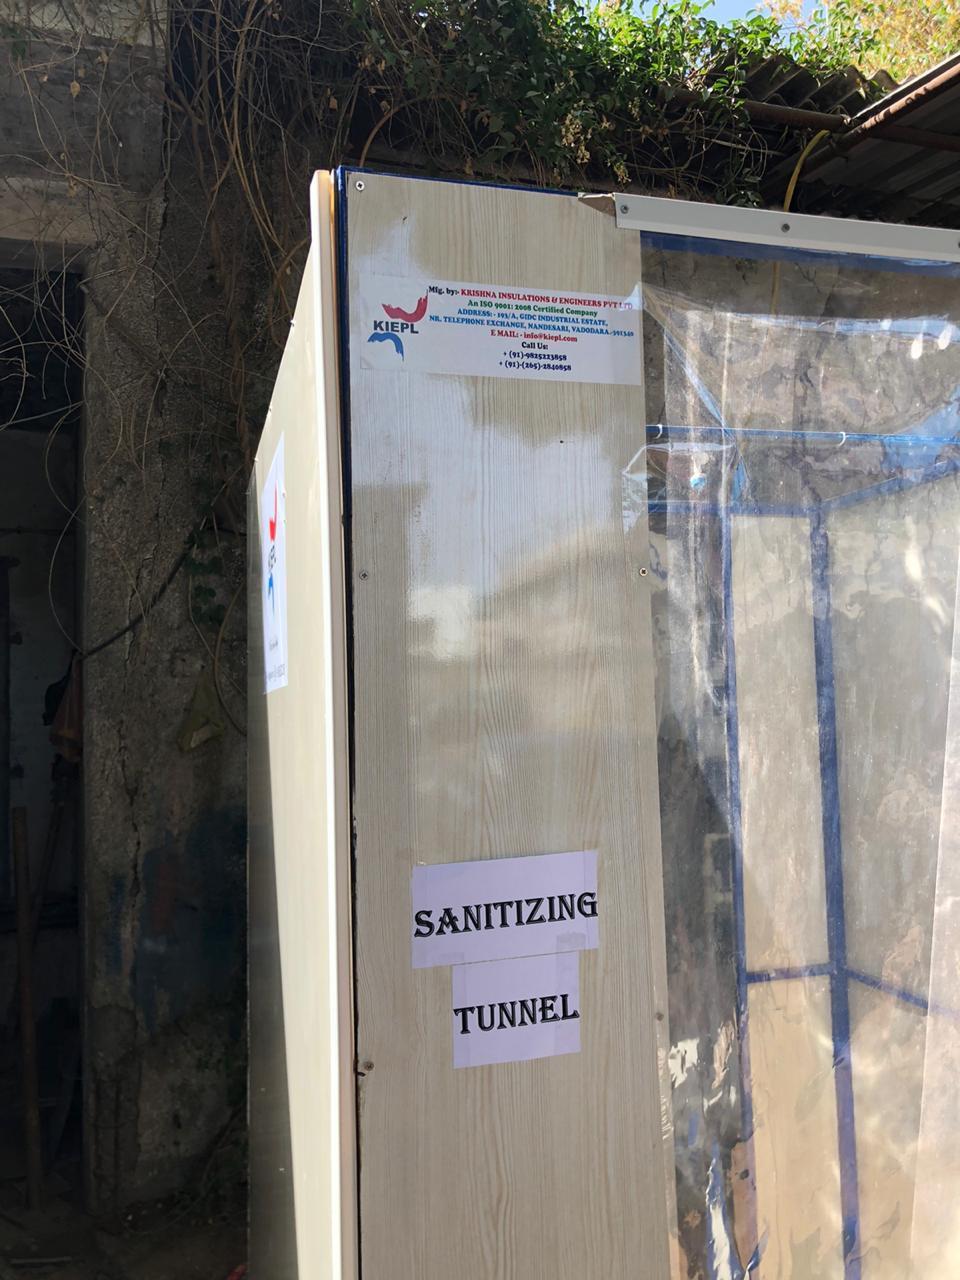 Sanitizing Tunnel